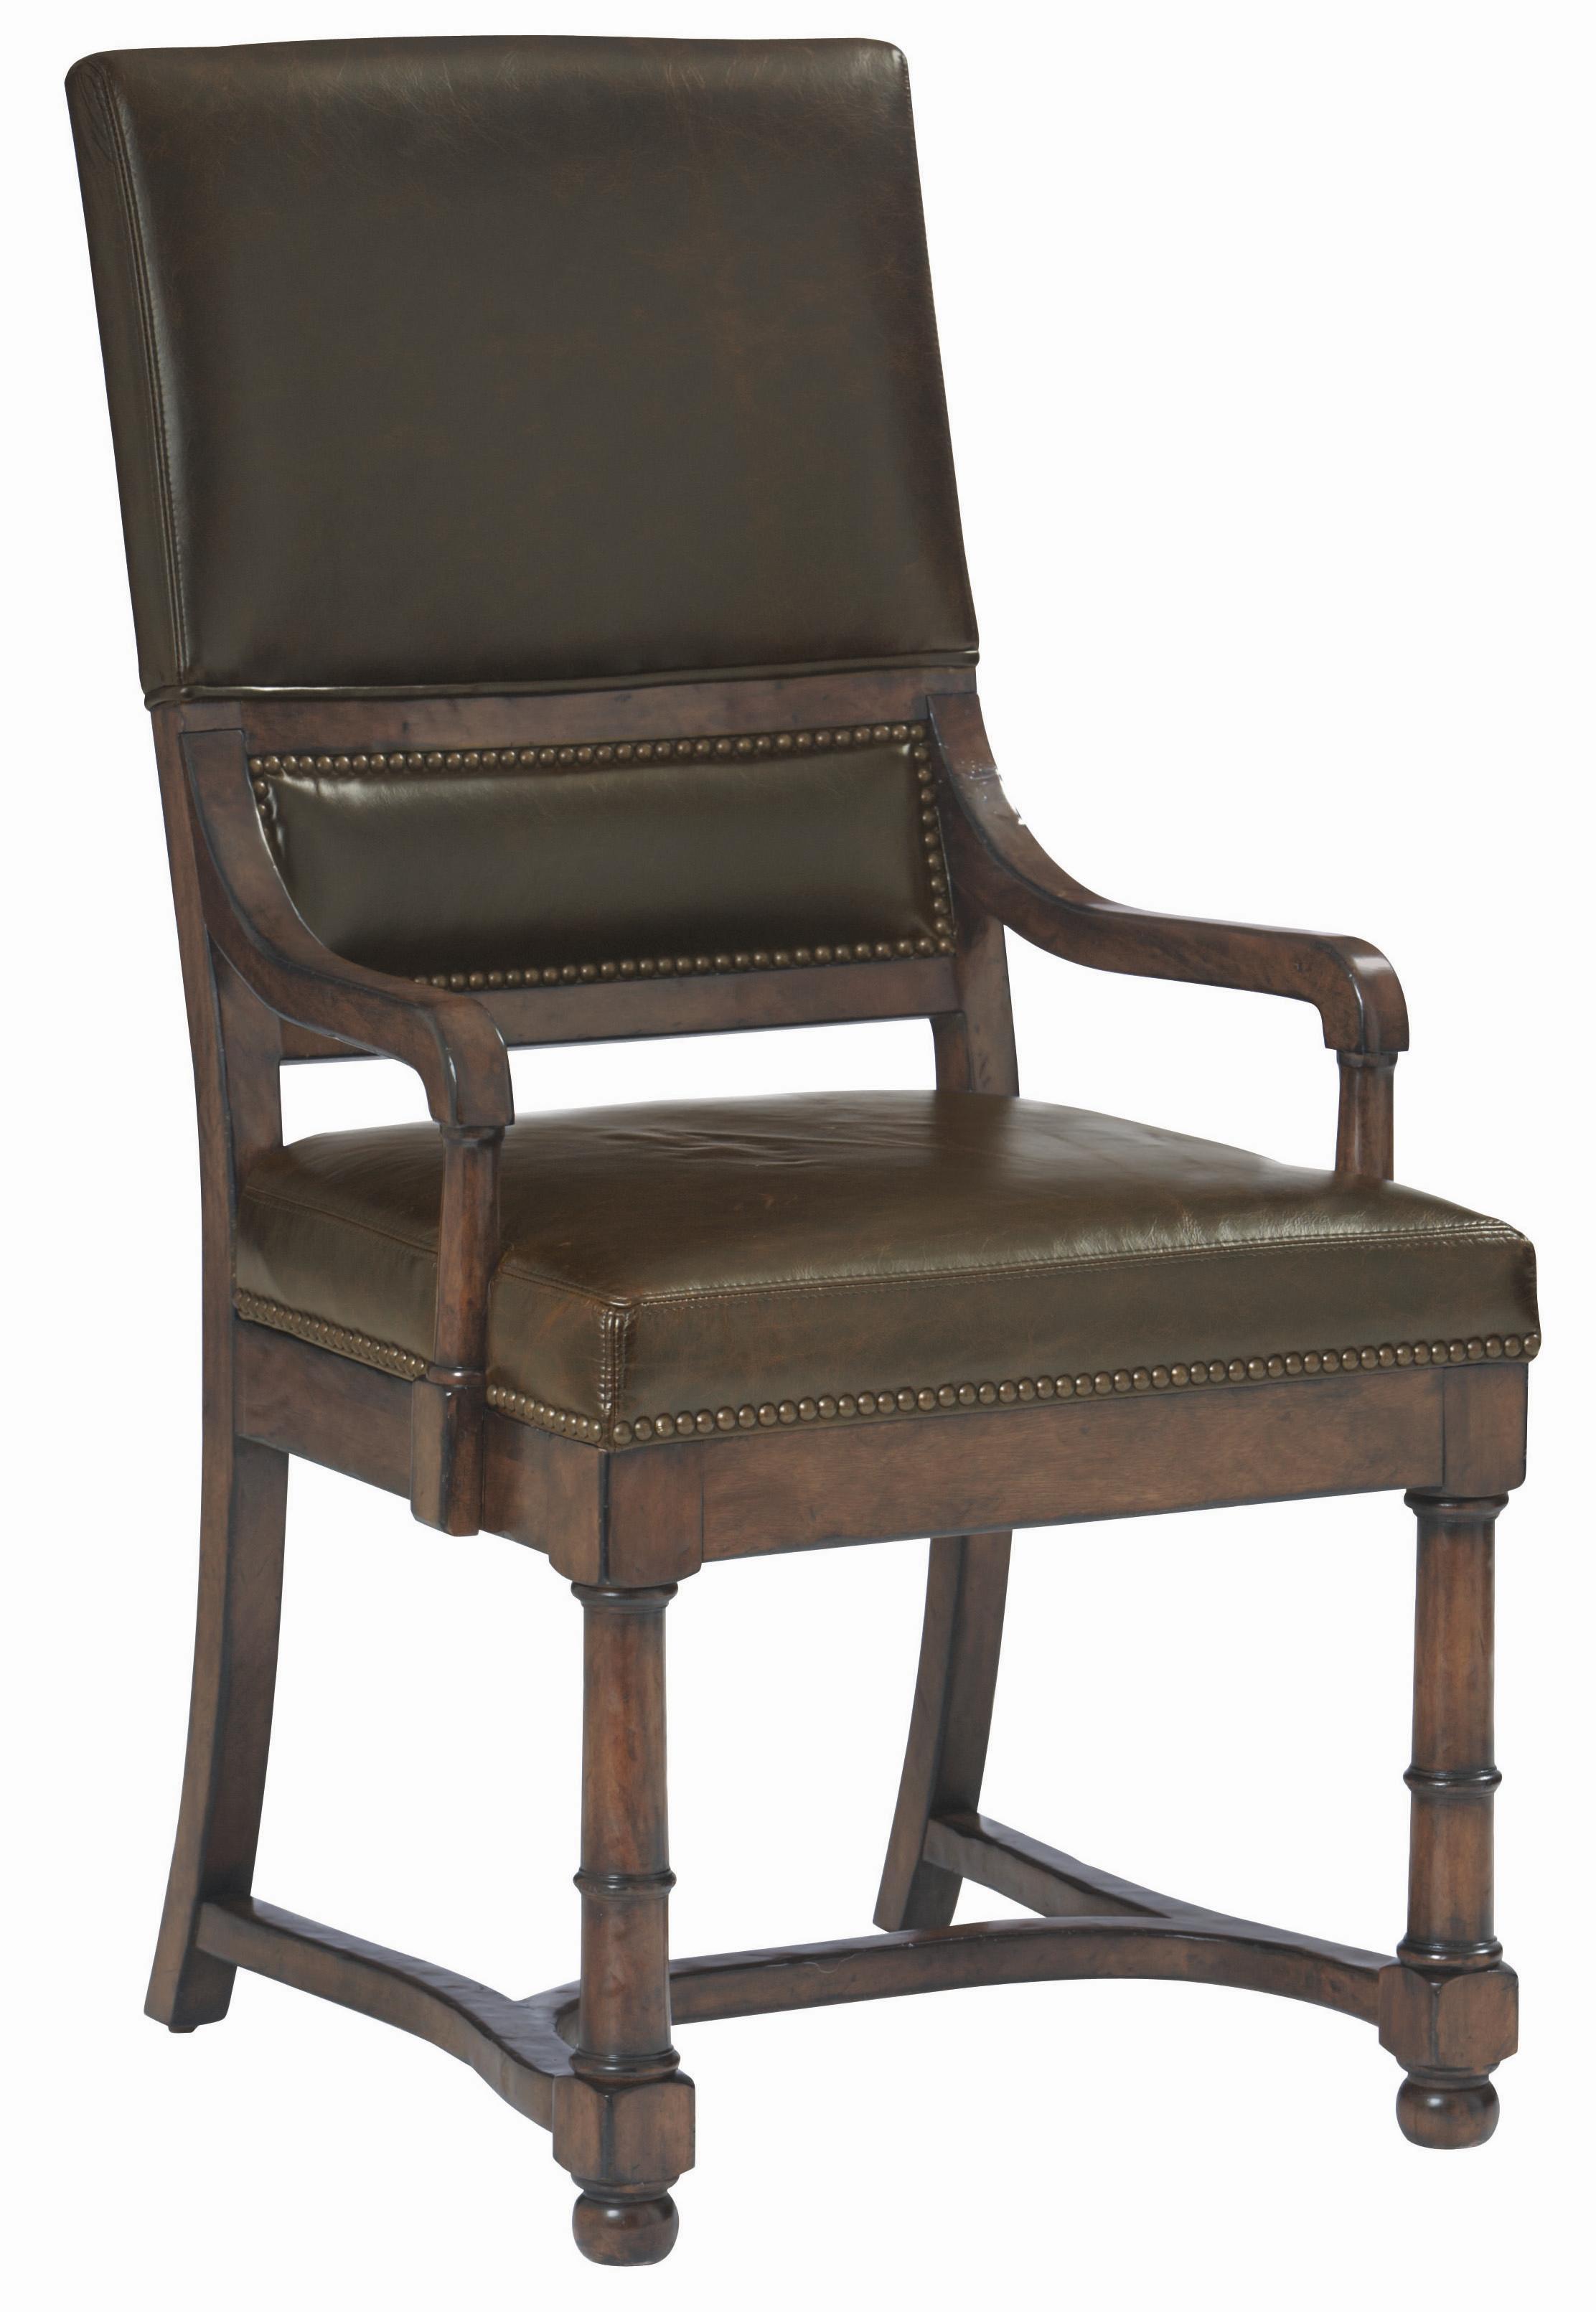 Bernhardt Villa Rica Villa Rica Leather Arm Chair - Item Number: 322-542